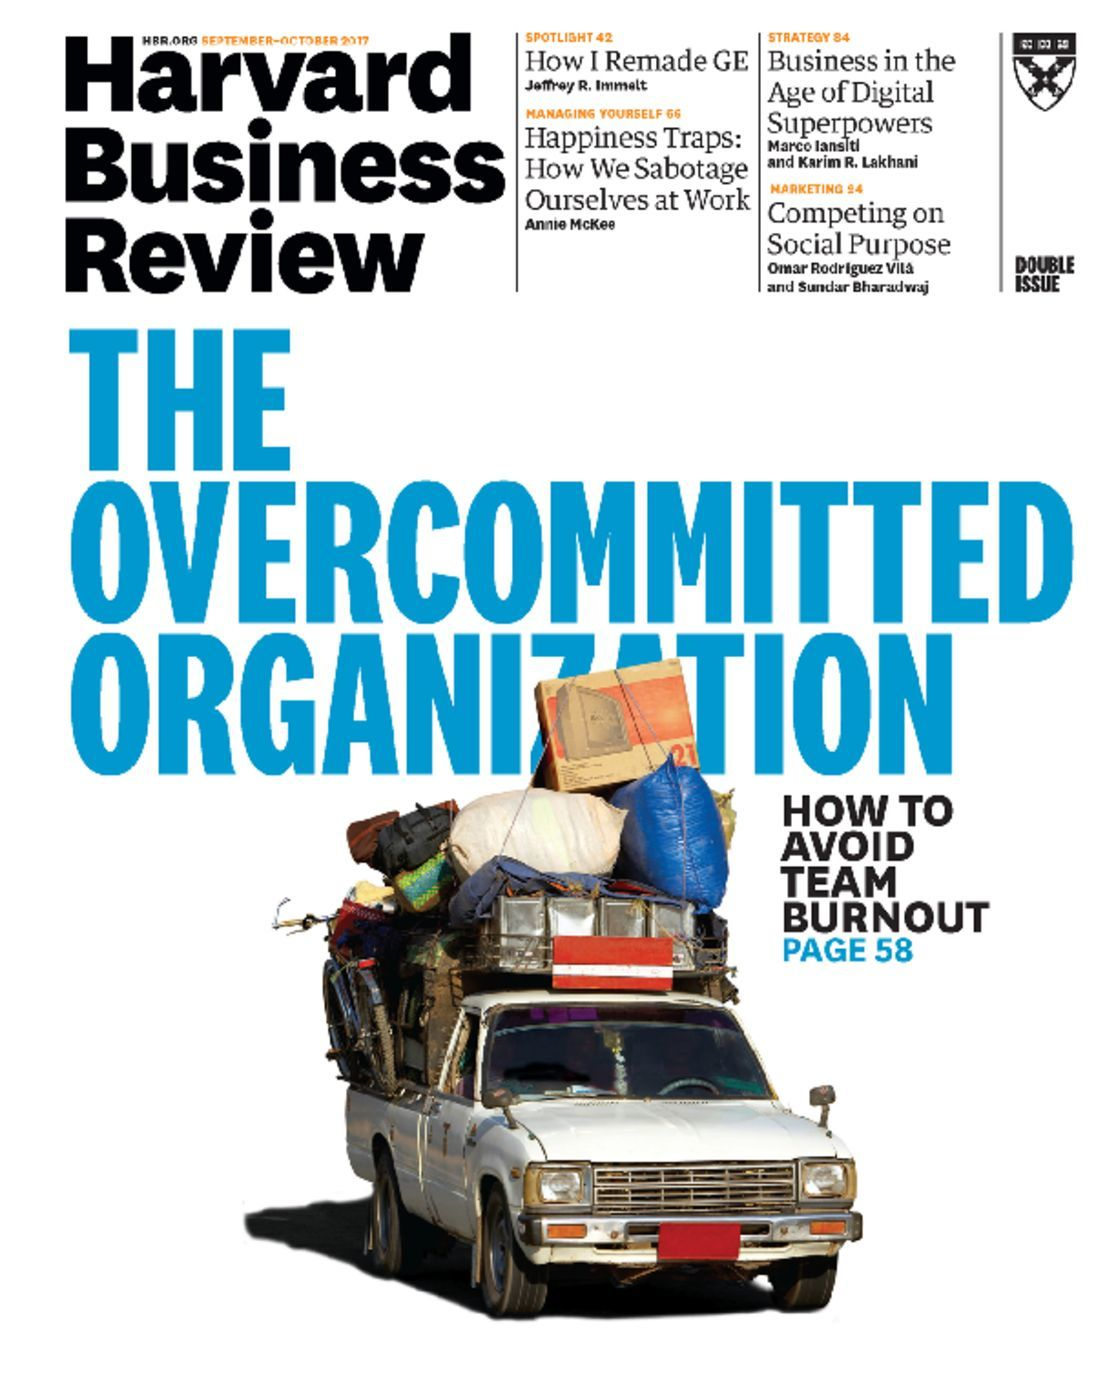 HARVARD BUSINESS REVIEW Impact Factor - scijournal.org